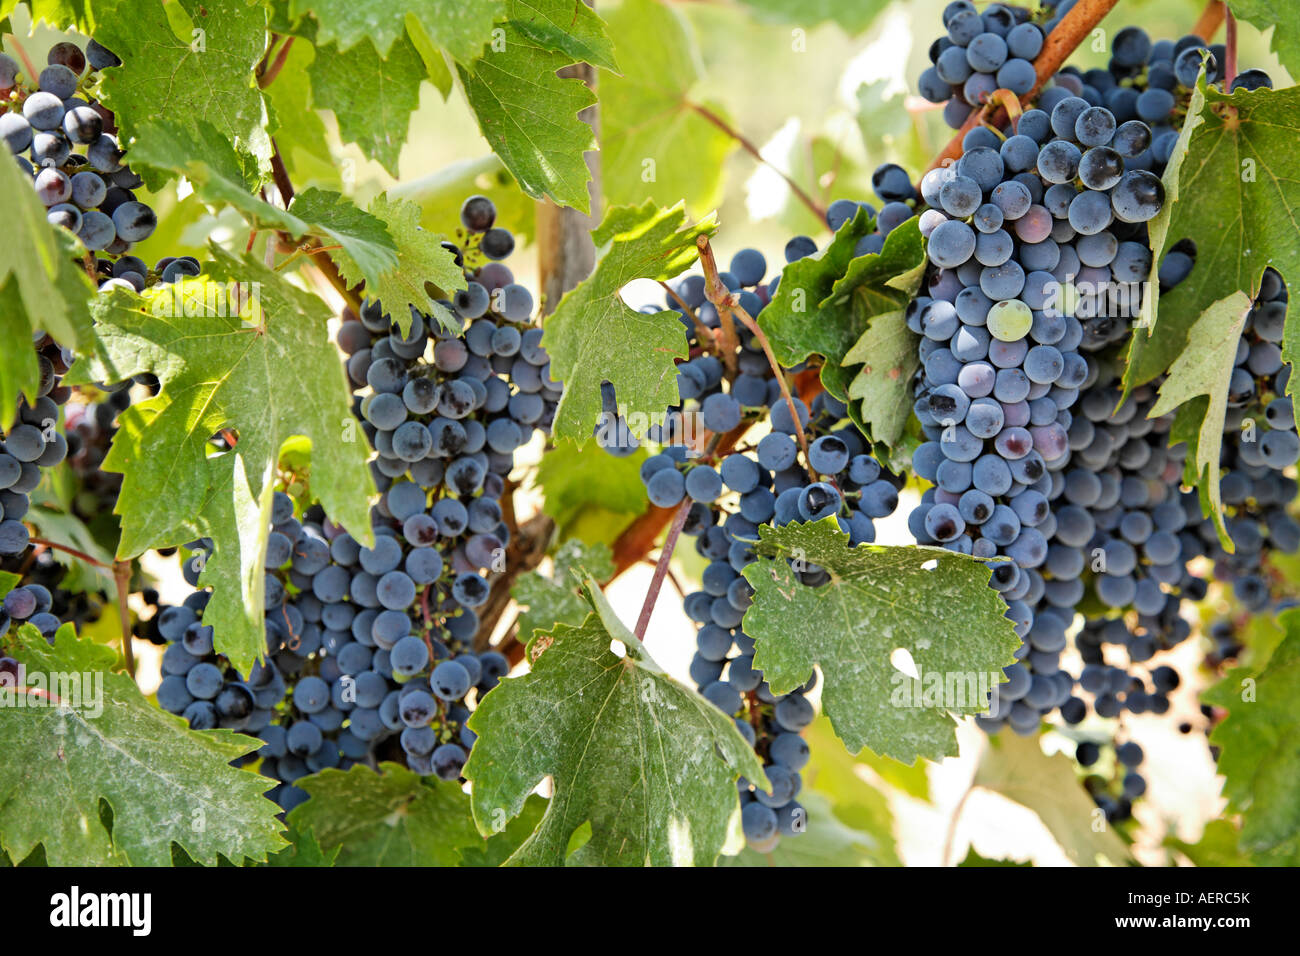 Black Grapes On Vines Tuscany Italy Europe - Stock Image